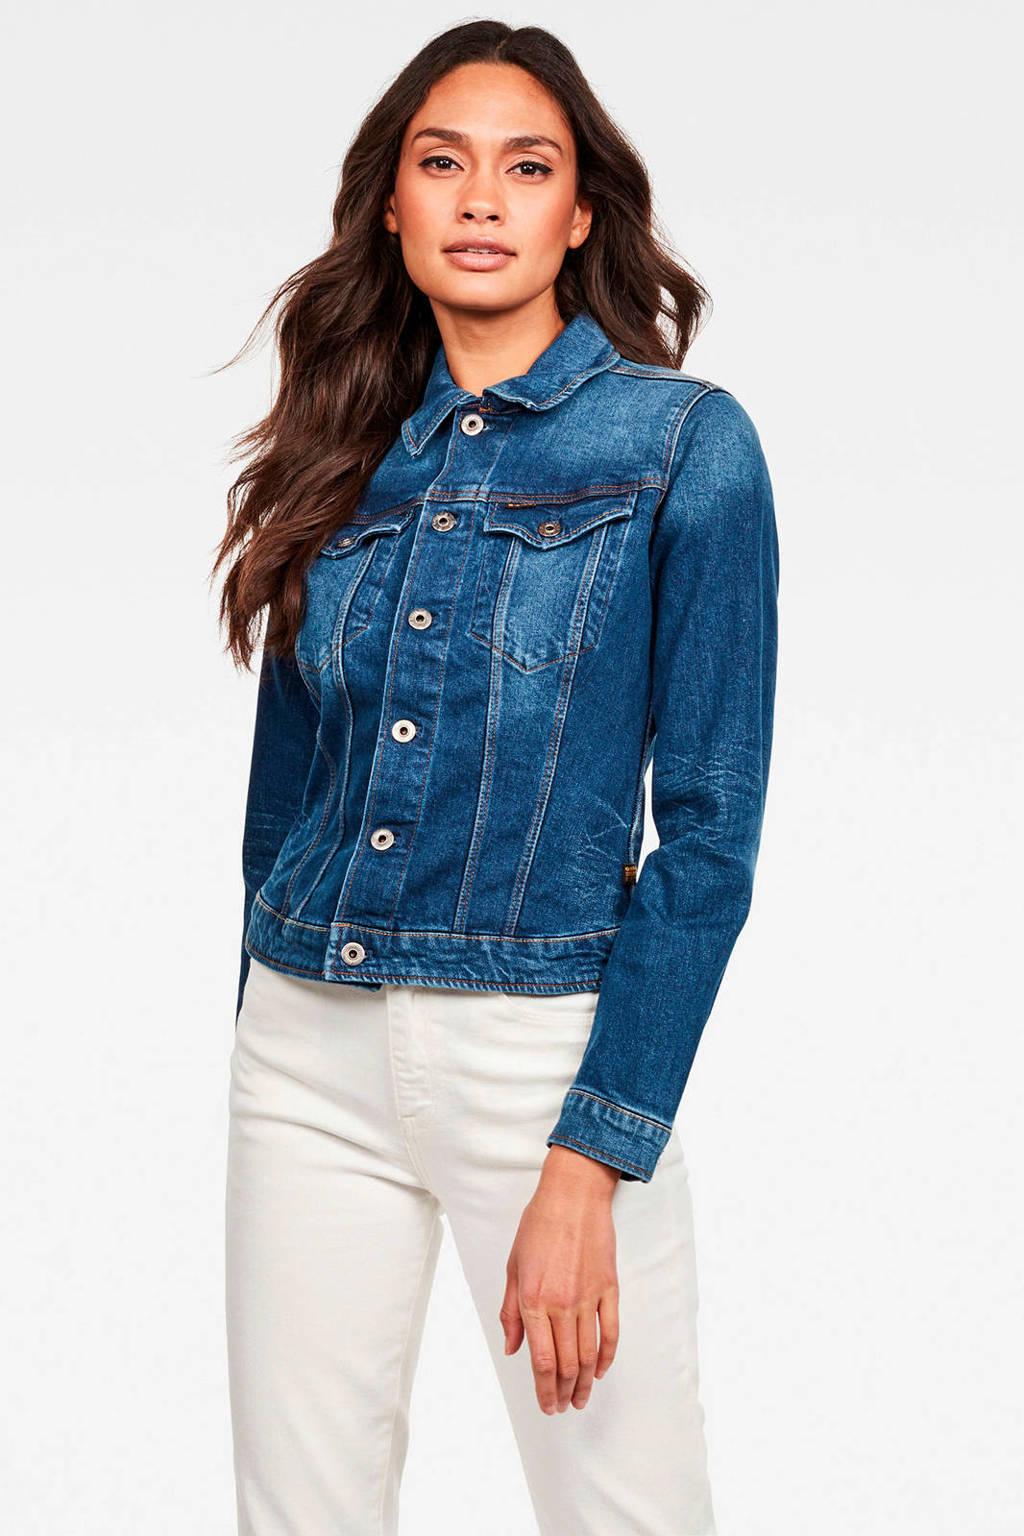 G-Star RAW spijkerjasje 3301 blauw, Blauw